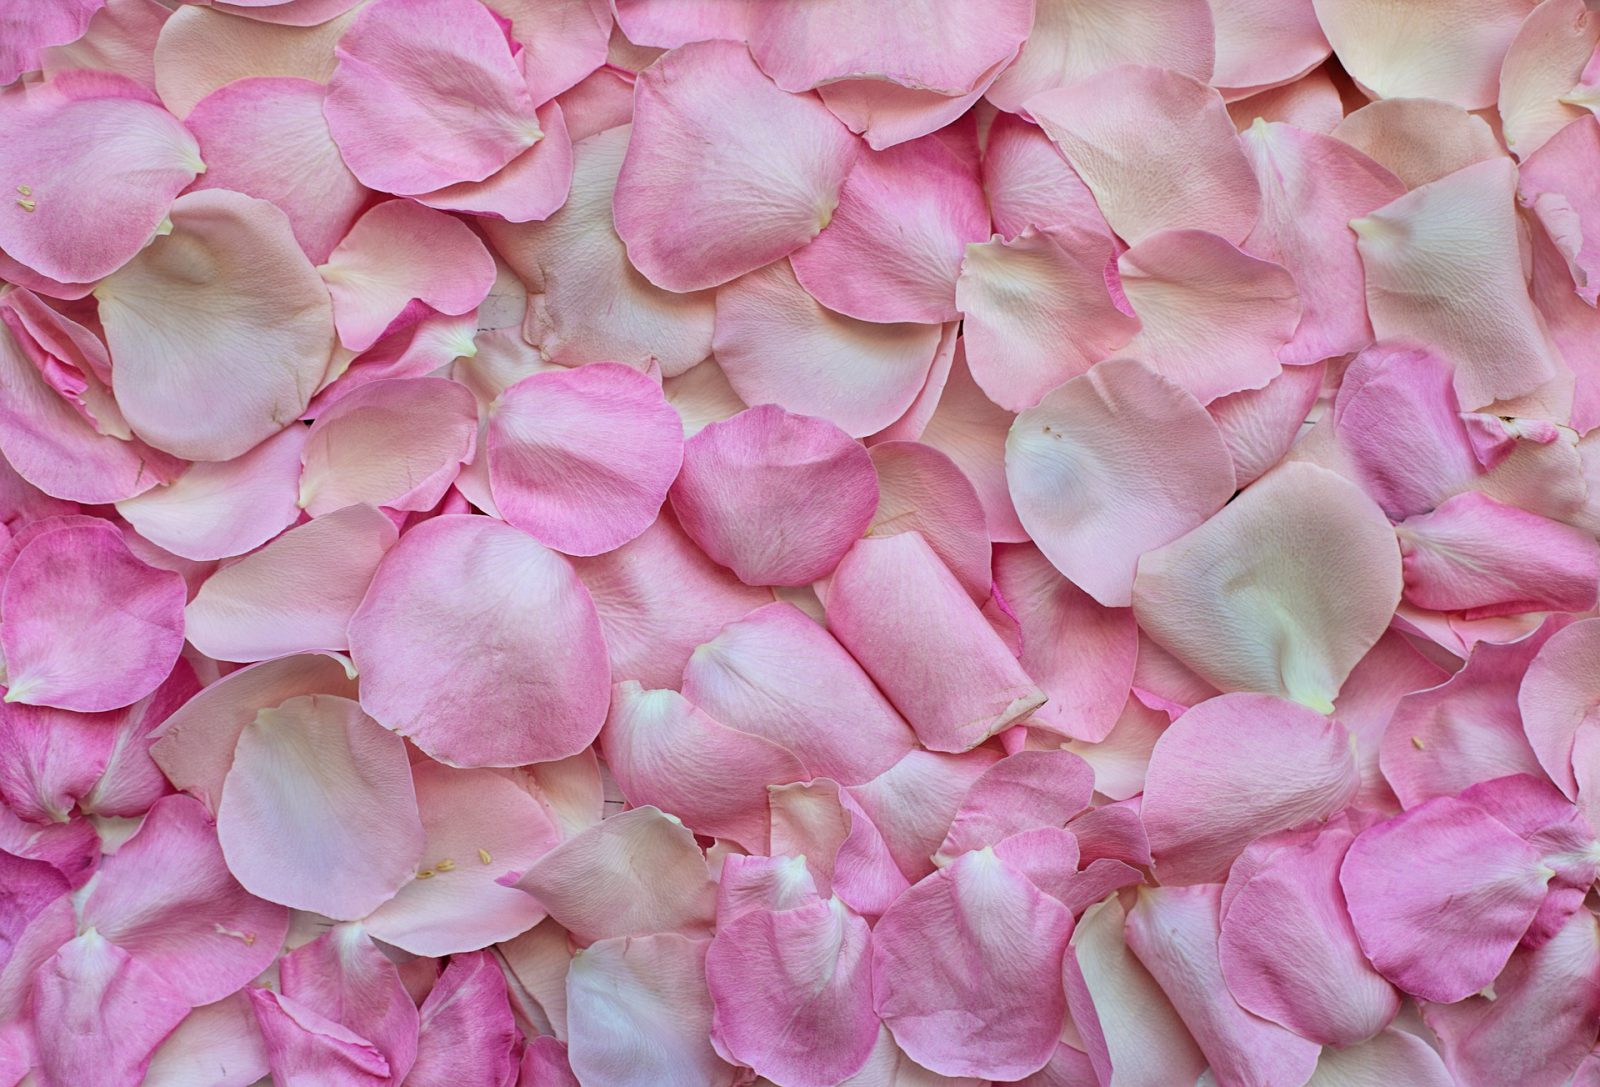 Haut, Hautpflege, Anti Aging, Beauty, Rose, Wildrosen, Wild Roses, Schminktante, Anja Frankenhäuser